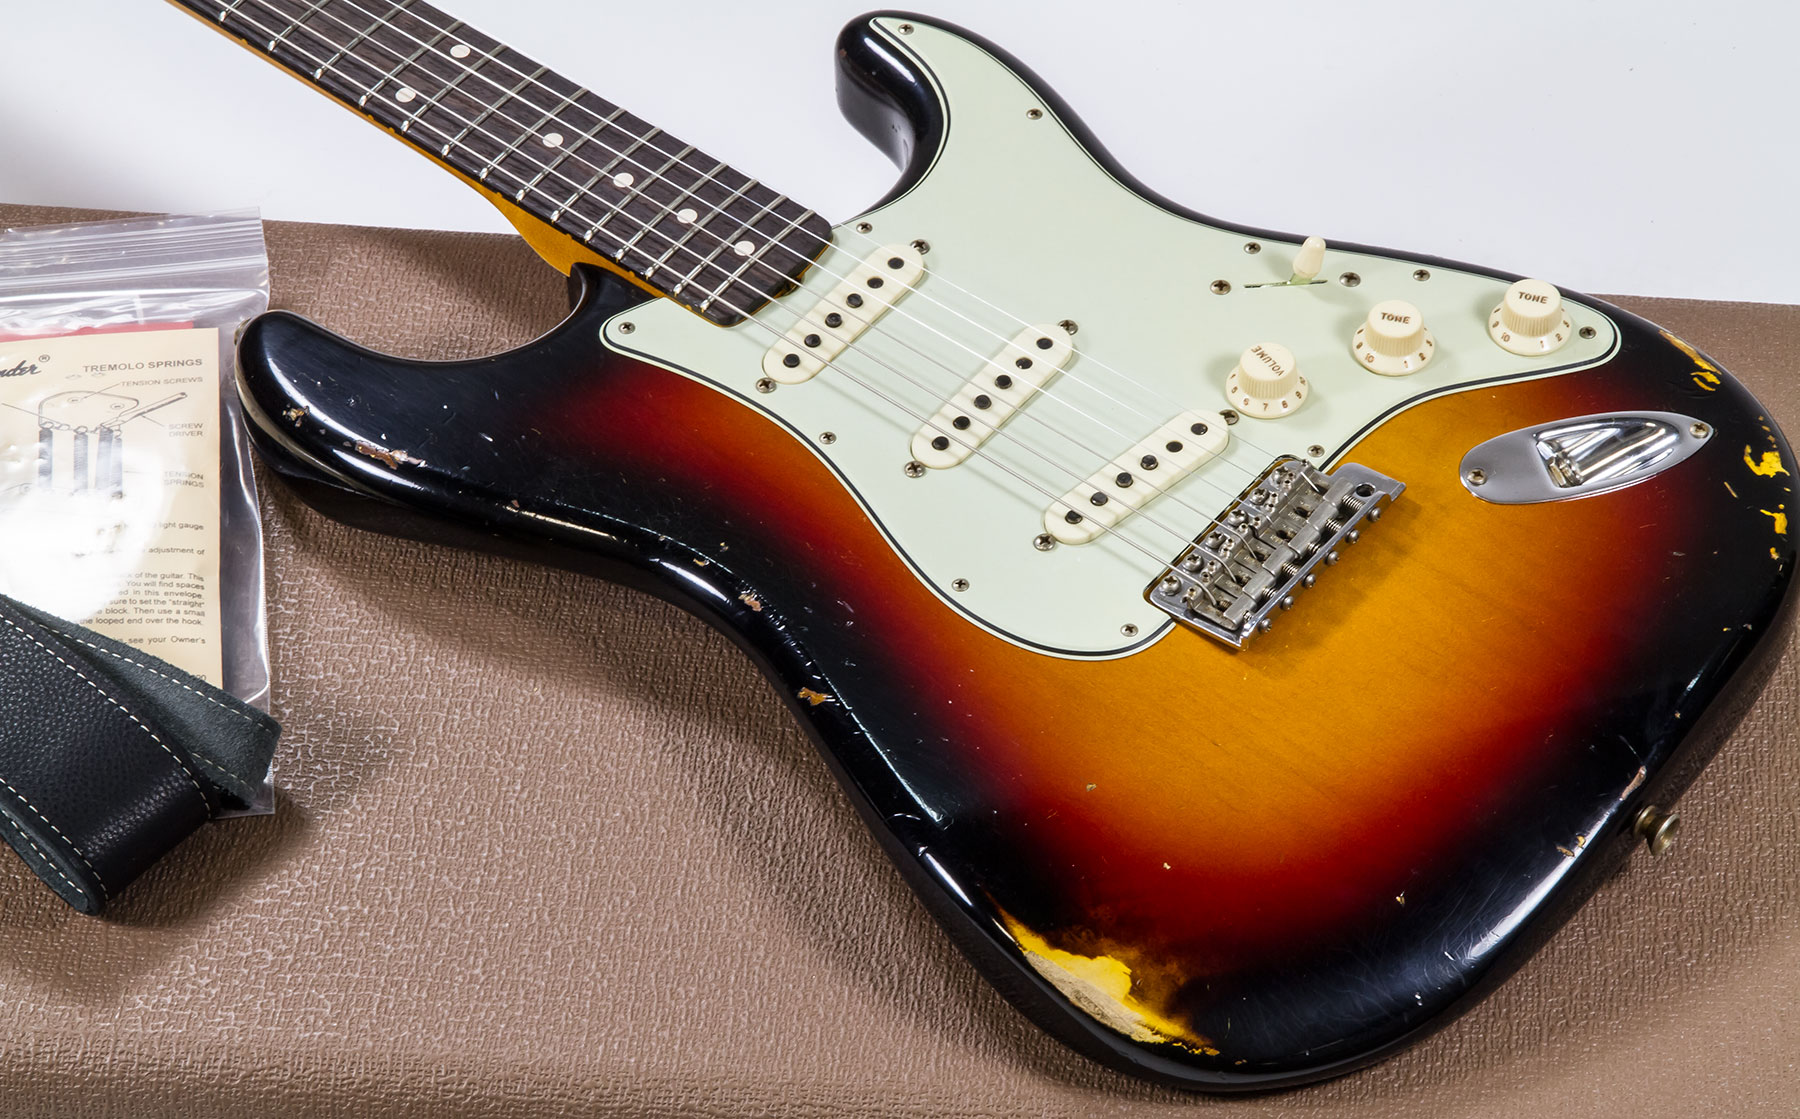 Custom Shop 1962 Stratocaster 2019 #R98416 - relic 3-color sunburst